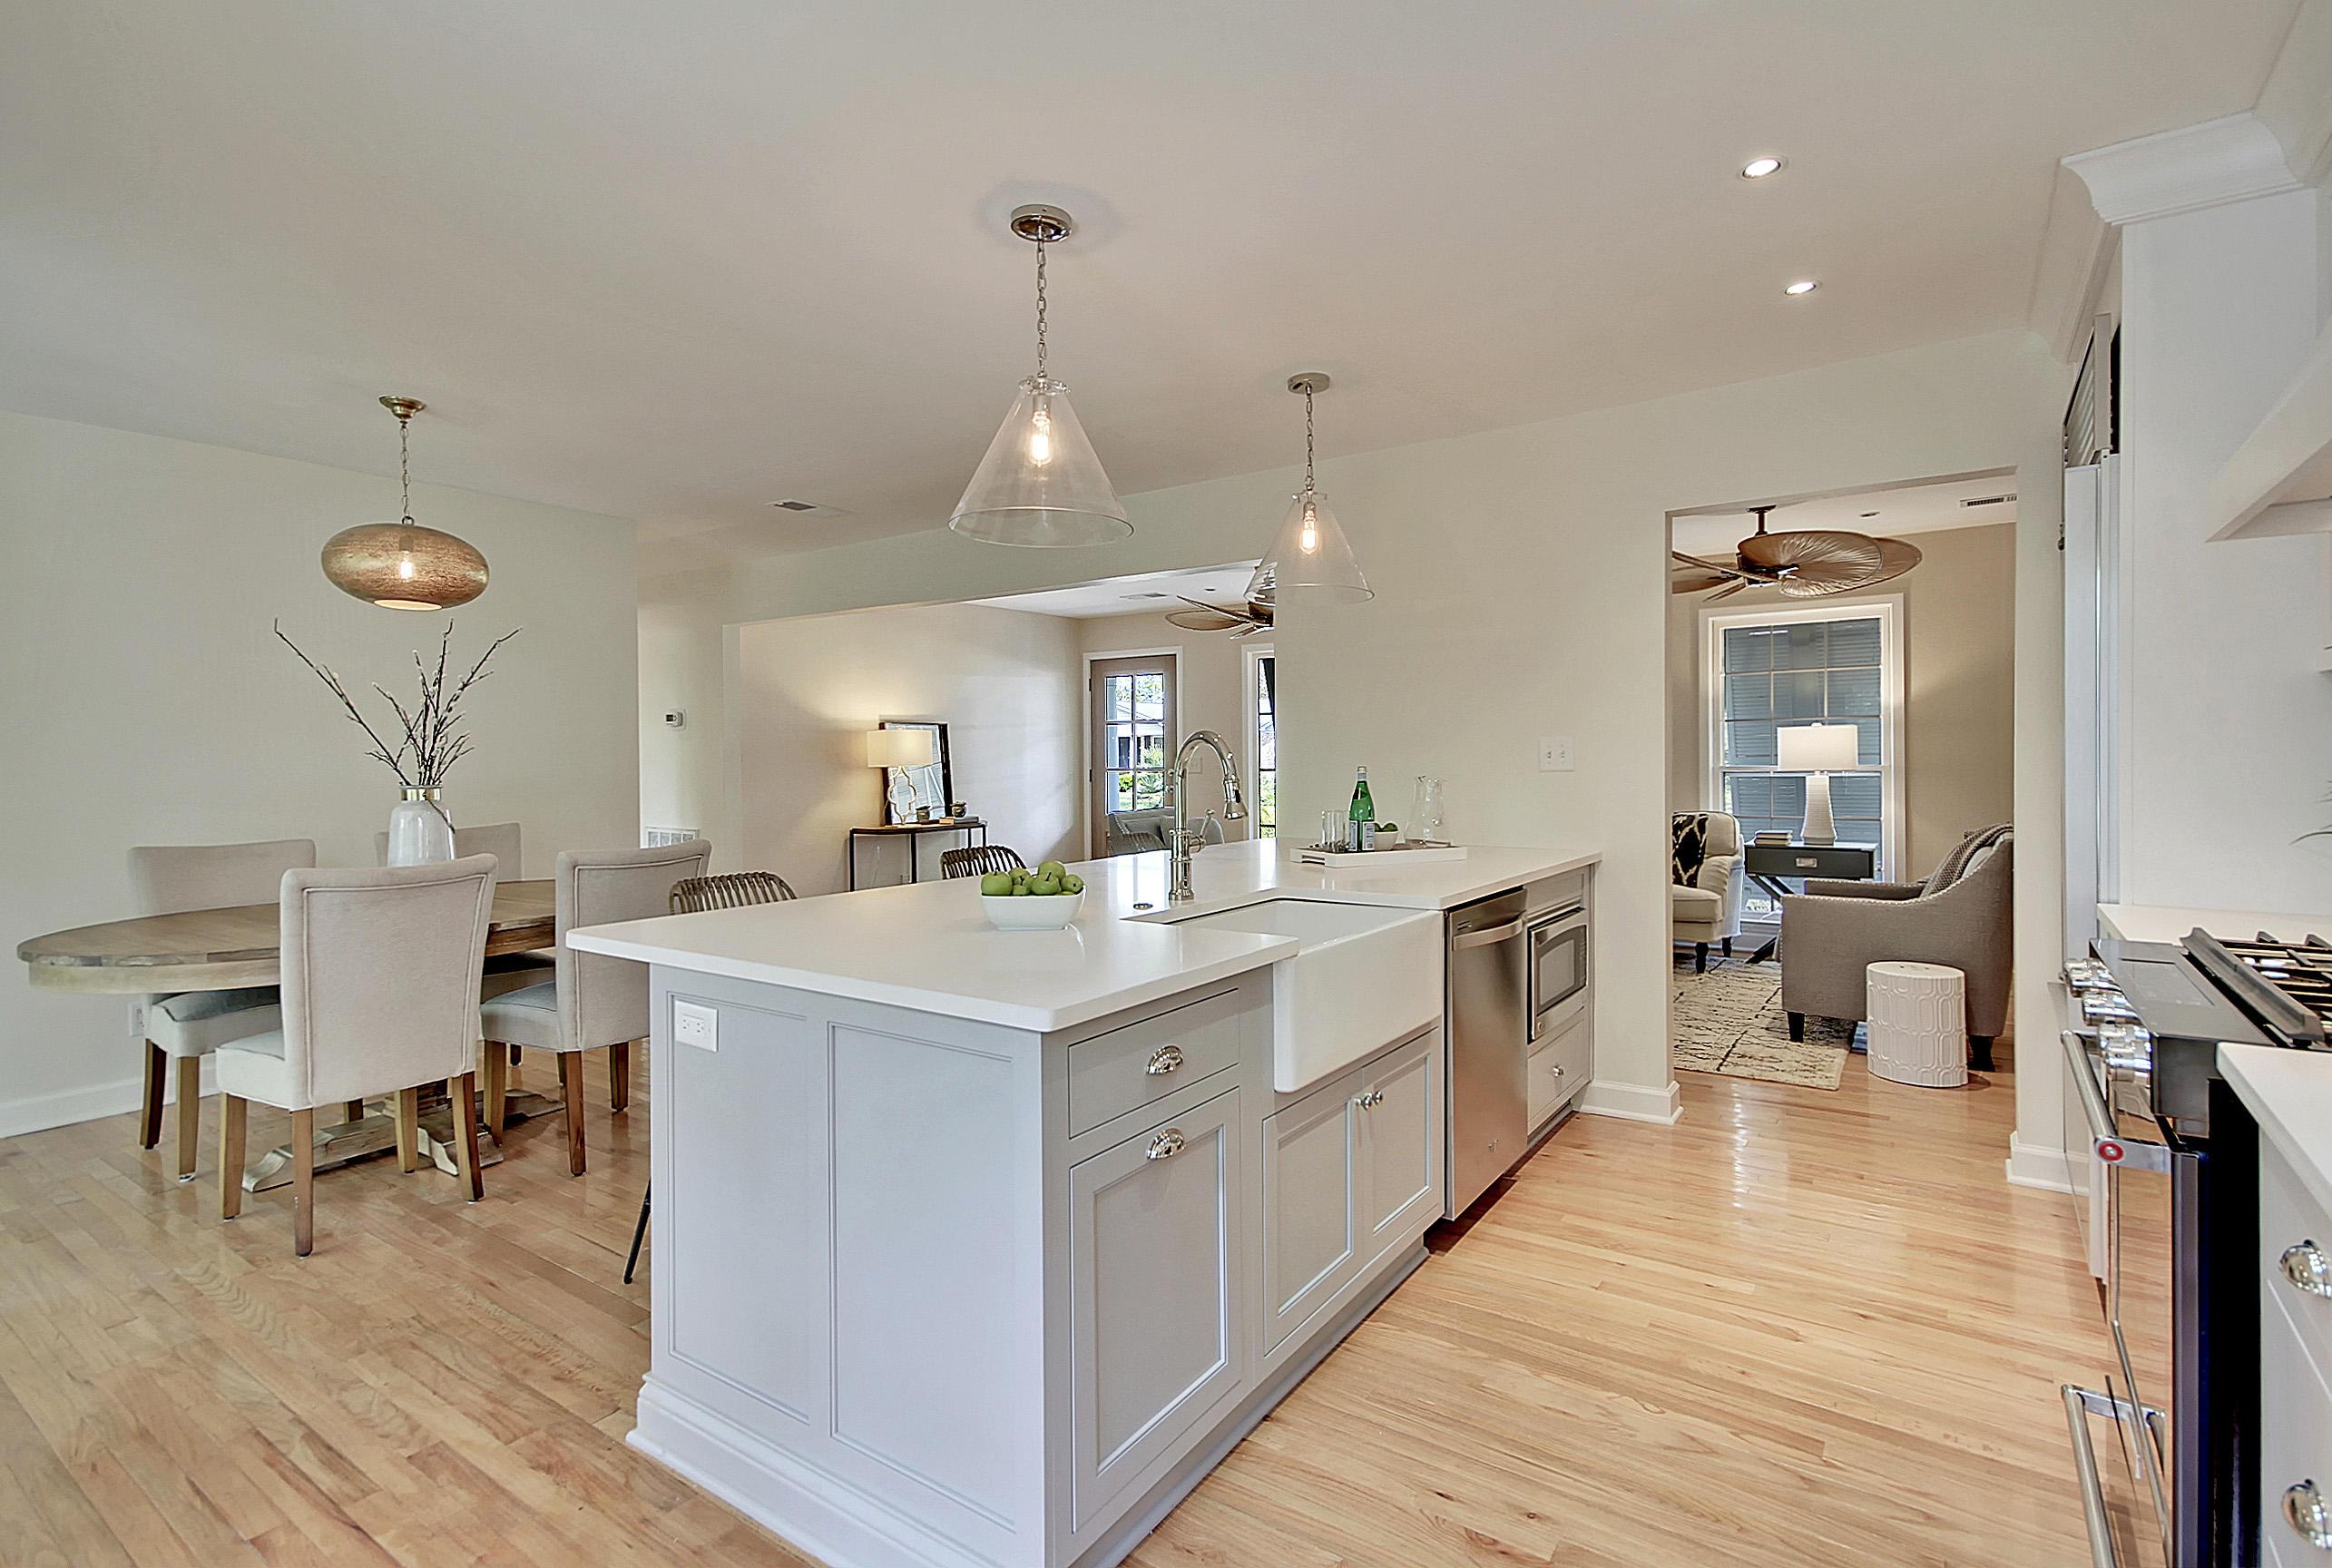 Old Mt Pleasant Homes For Sale - 1466 Glencoe, Mount Pleasant, SC - 30